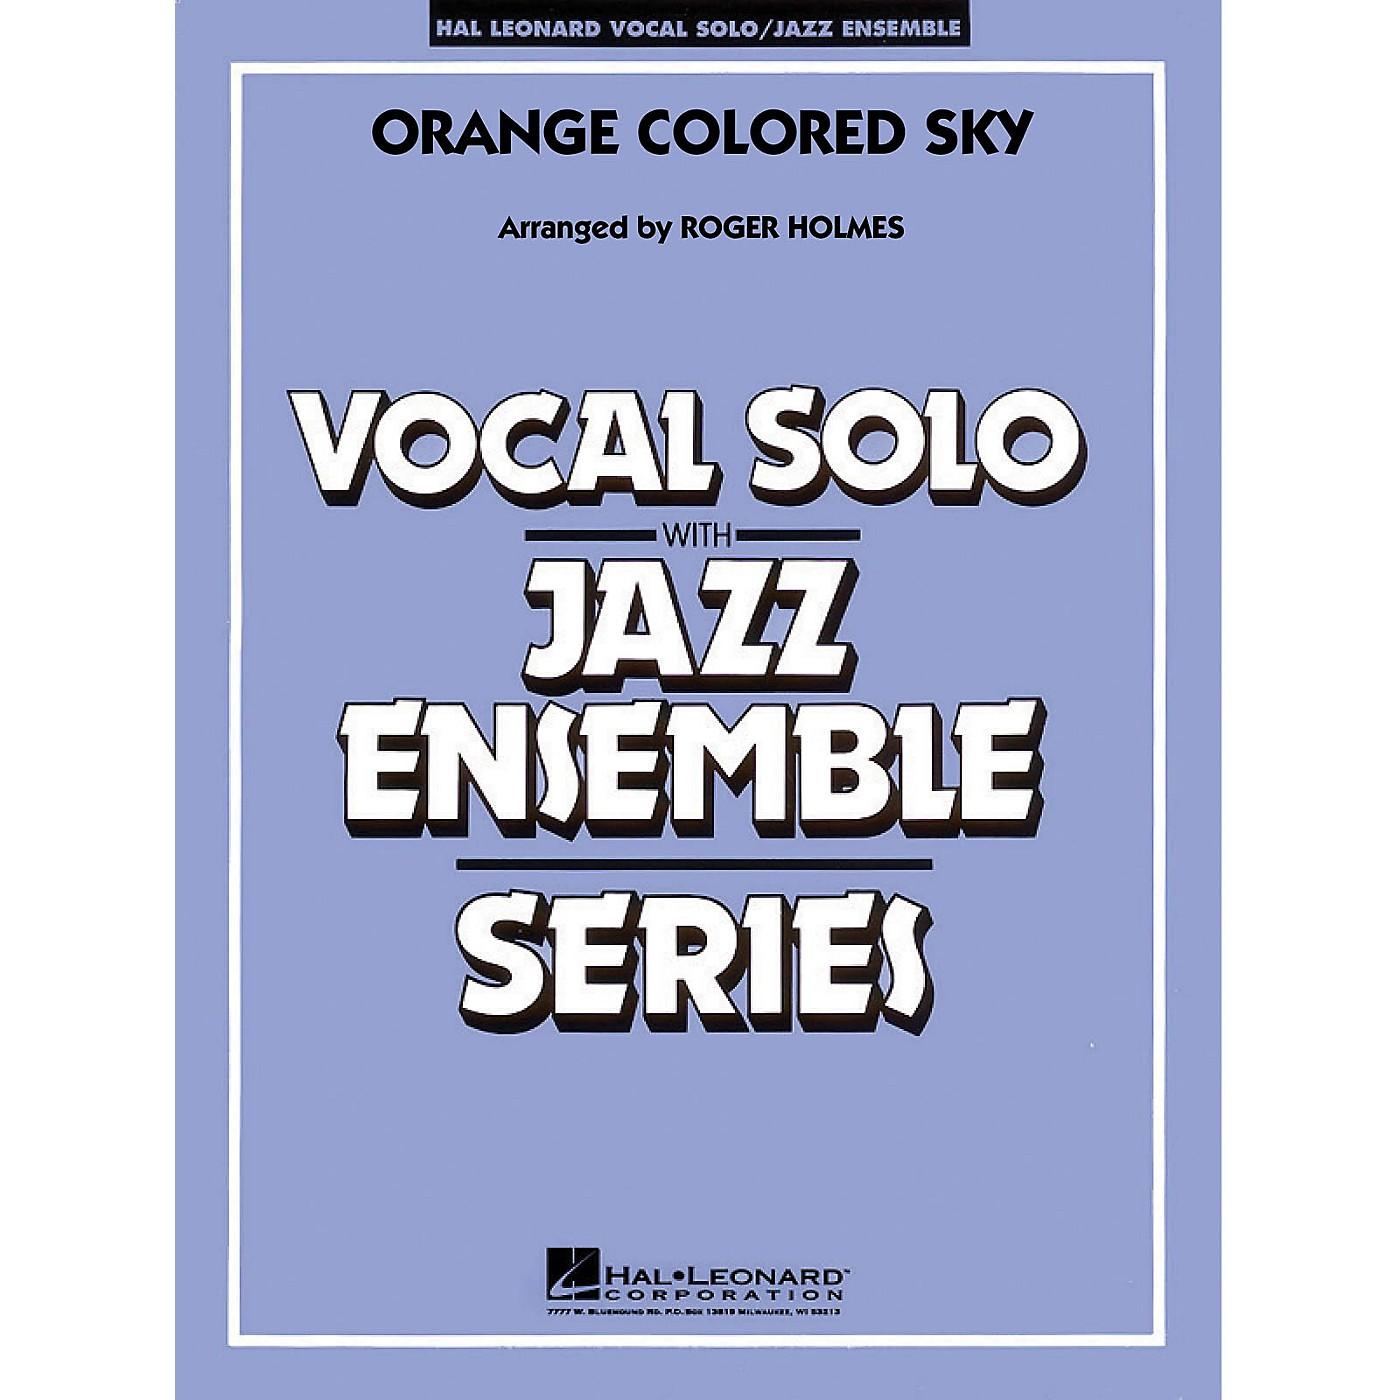 Hal Leonard Orange Colored Sky (Key: G) (Vocal Solo with Jazz Ensemble) Jazz Band Level 3-4 Composed by Milton DeLugg thumbnail